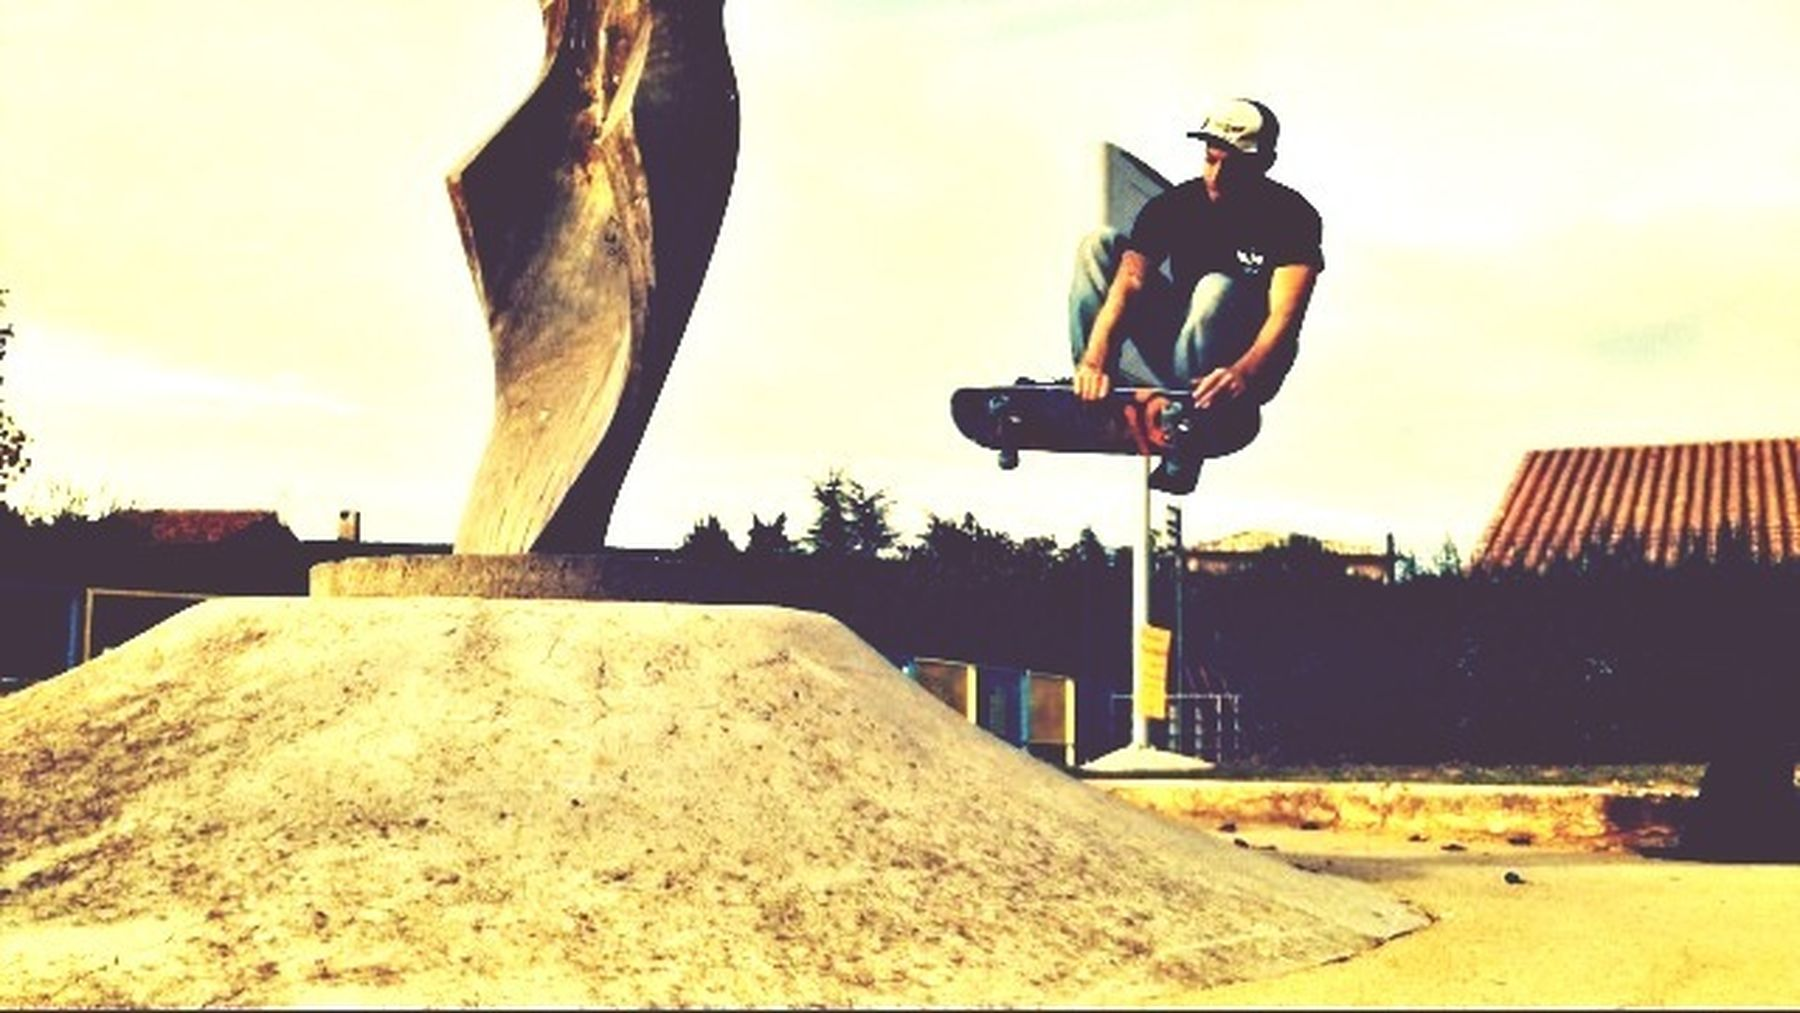 Skateboarding Fly Colors Enjoying Life